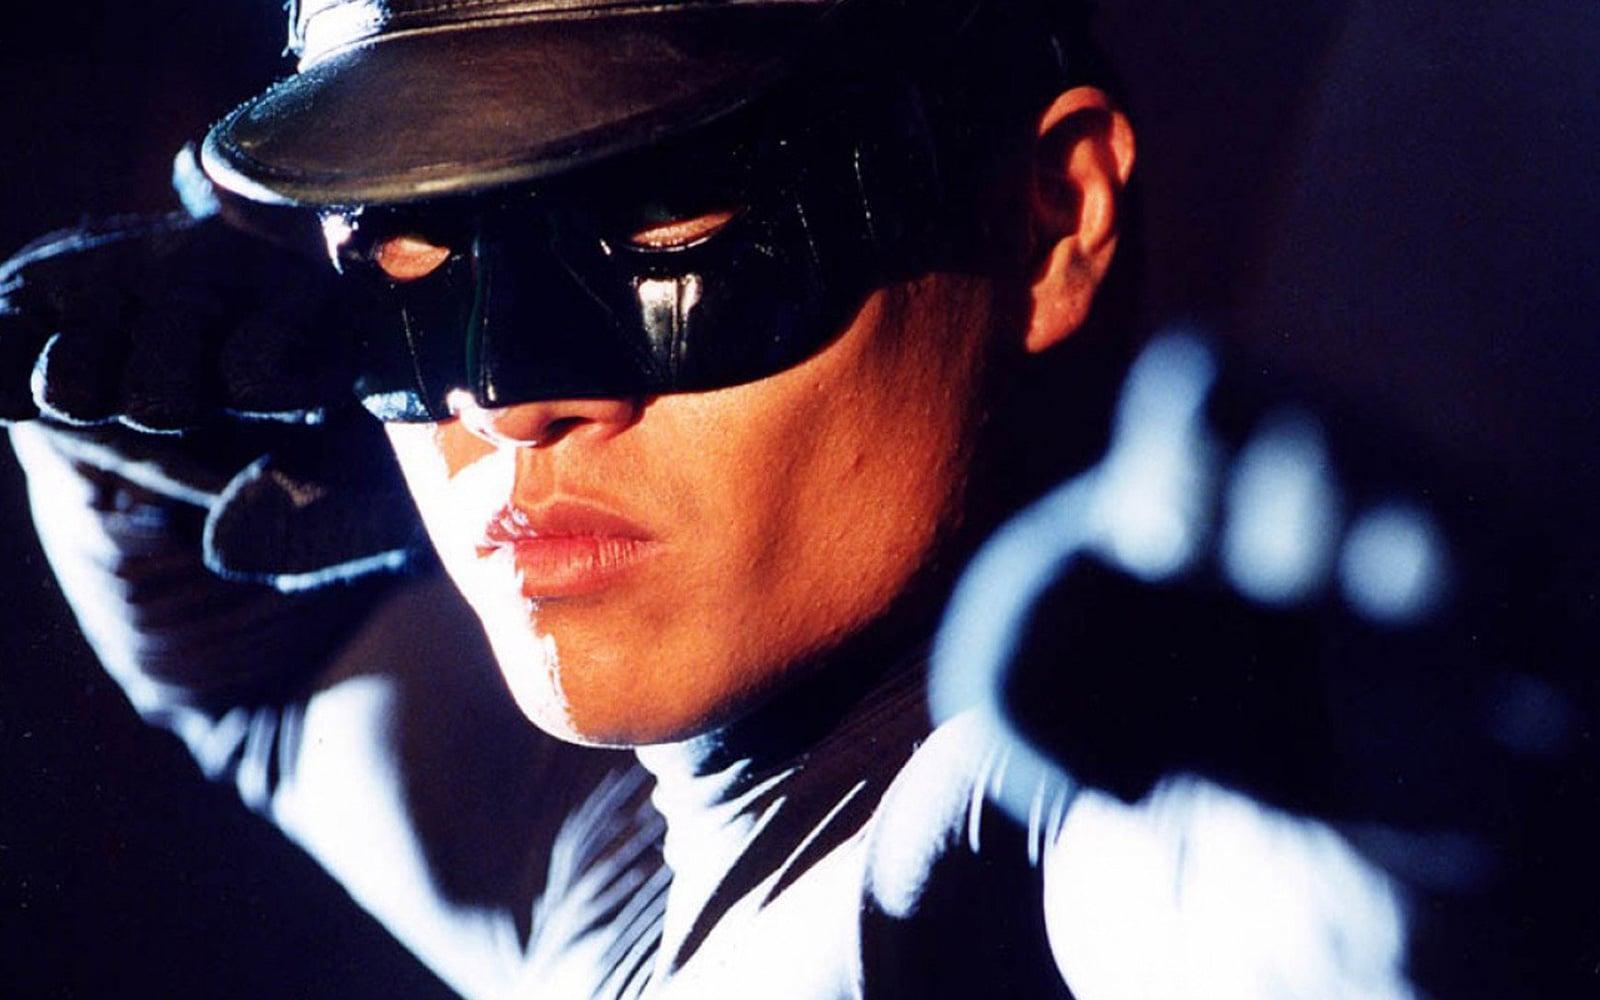 Black Mask 2: City of Masks - Tsui Hark